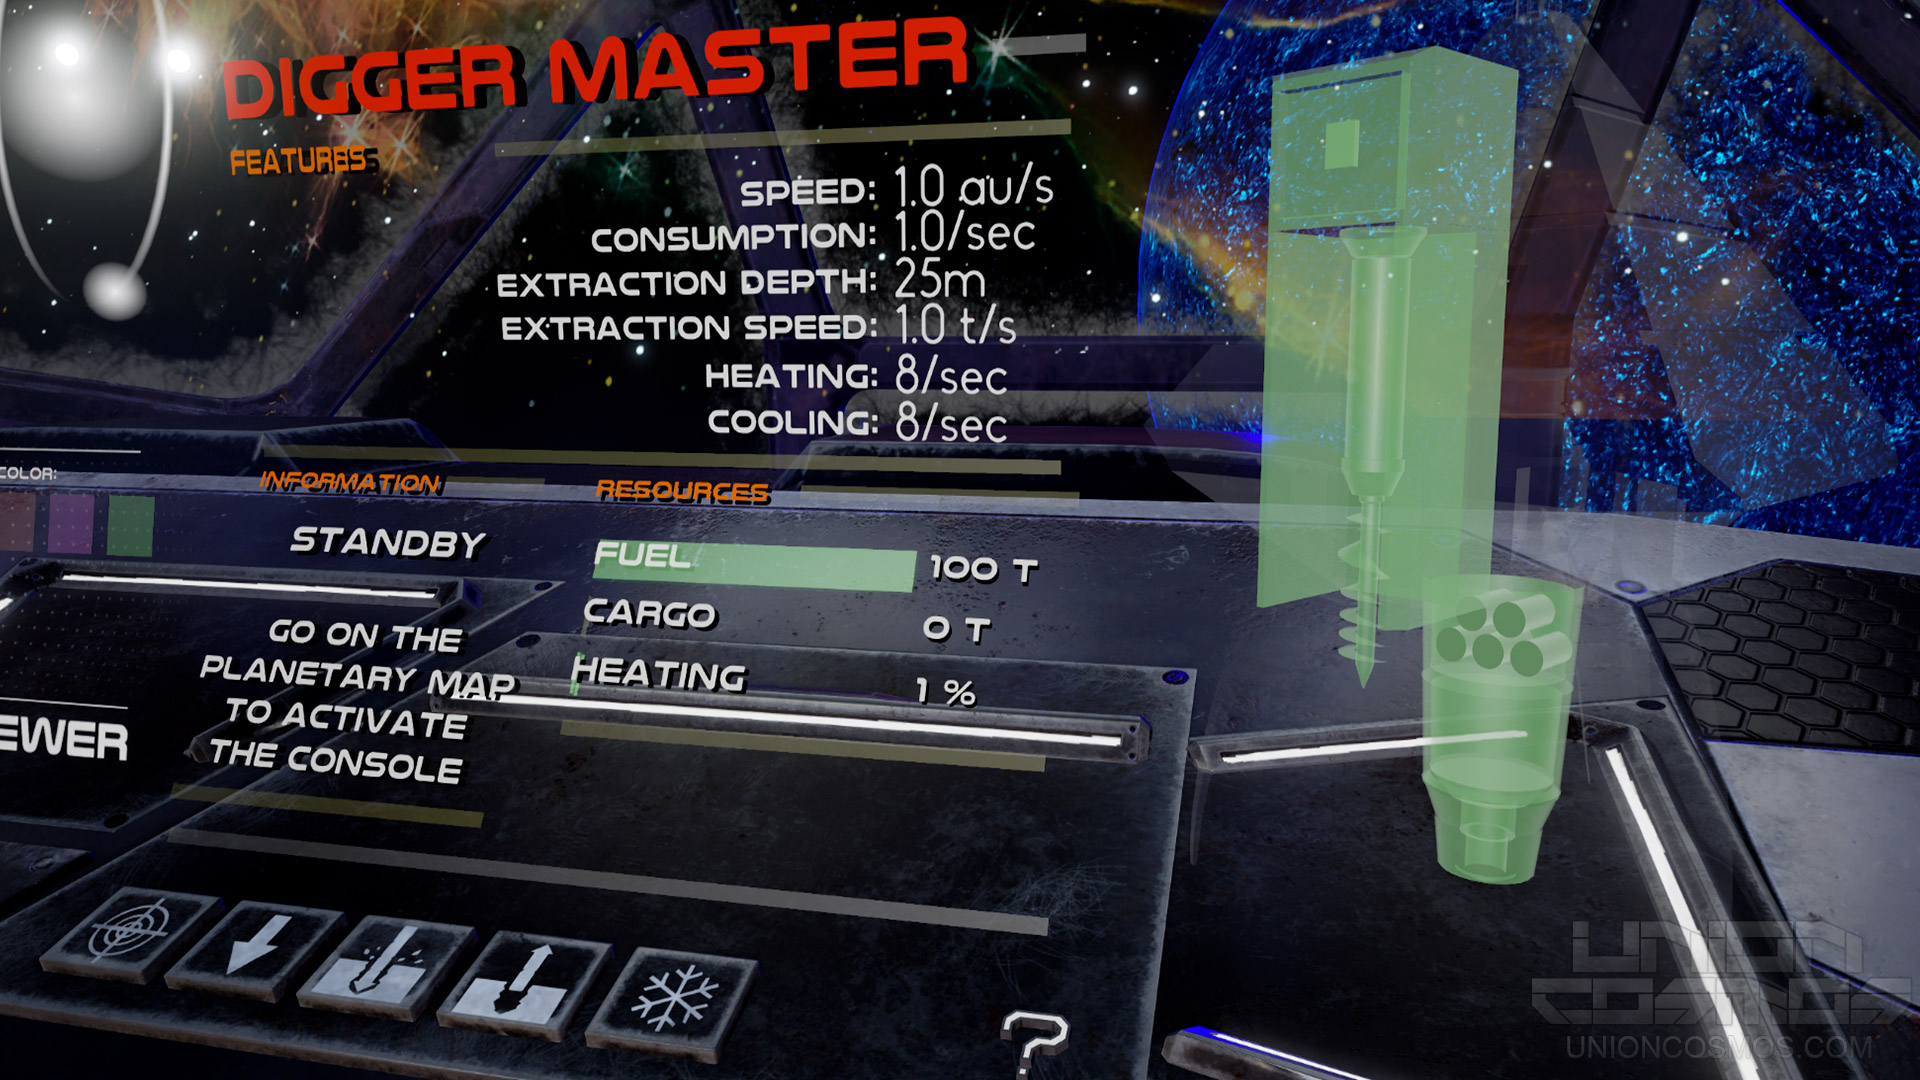 union-cosmos-far-beyond-a-space-odyssey-console-dg